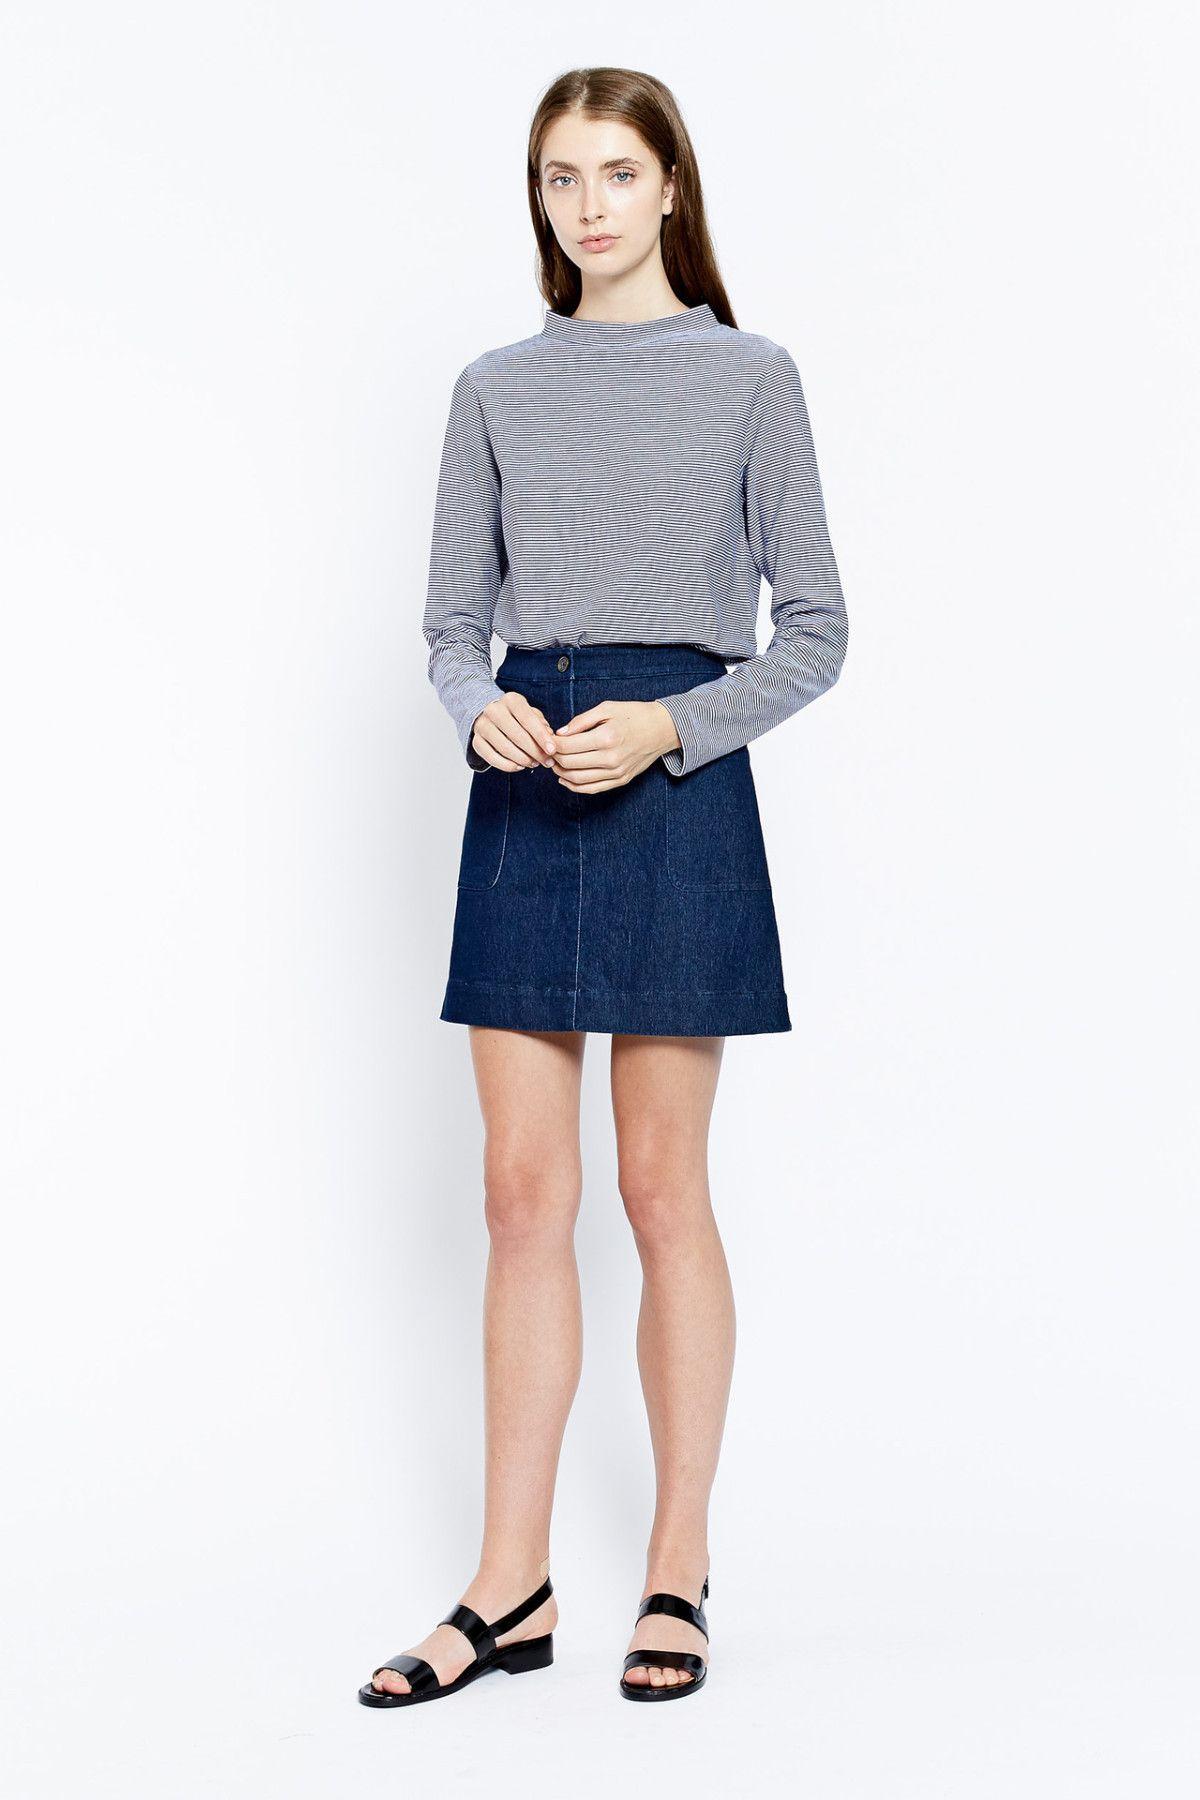 Vanishing Elephant - Mid-Thigh Denim Skirt